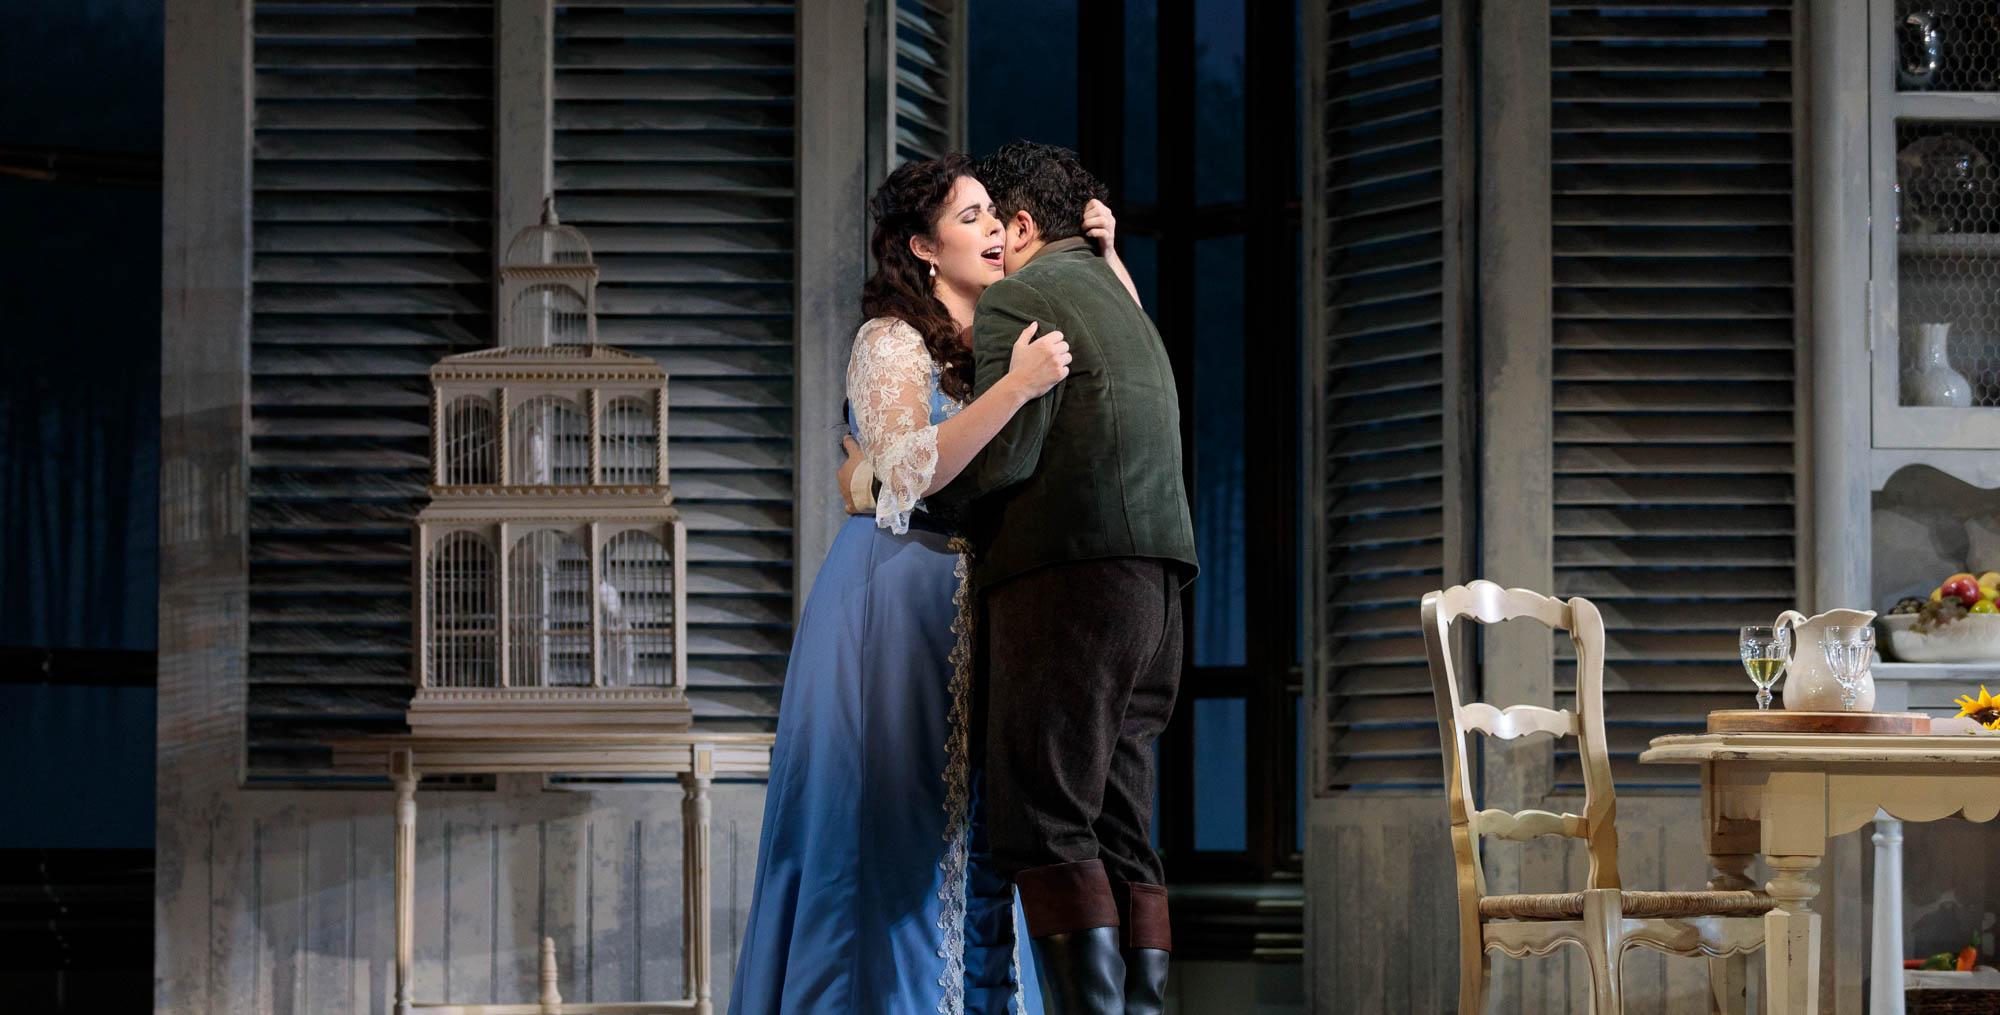 Couple embraces it the 2019 production of La traviata.